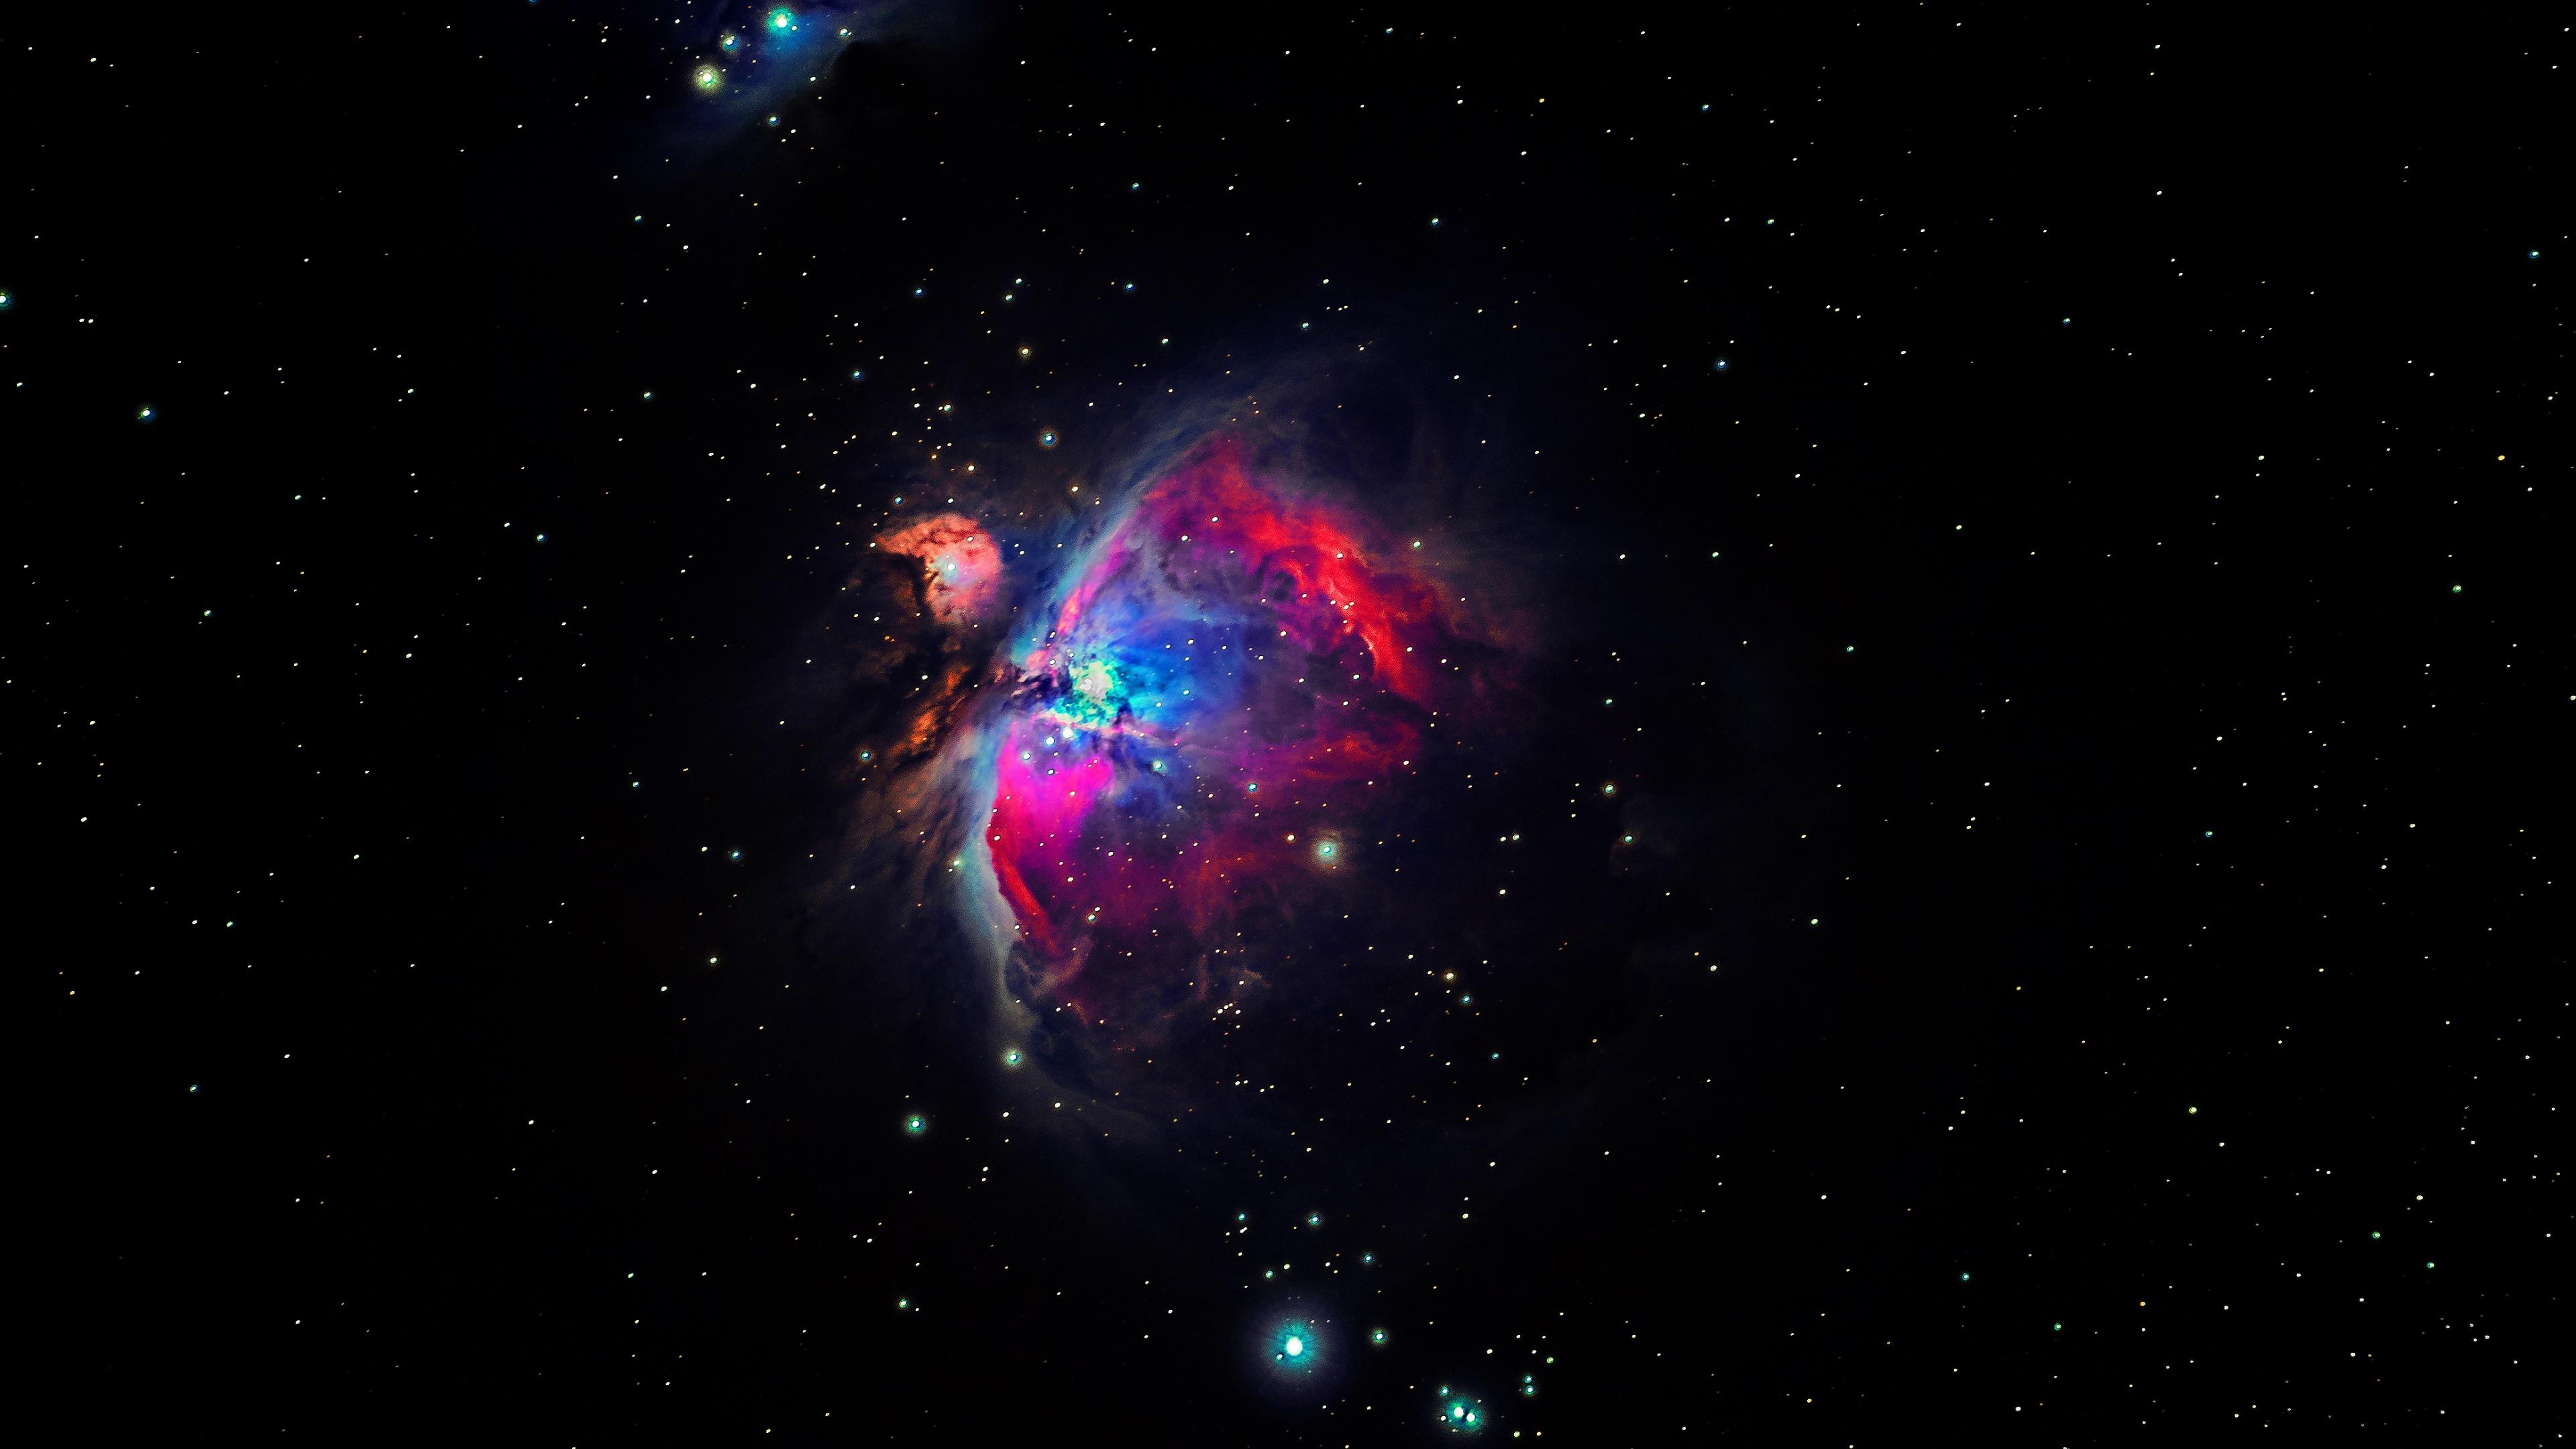 Orion nebula 4k ultrahd wallpaper backiee free ultra hd wallpaper platform - Galaxy nebula live wallpaper ...